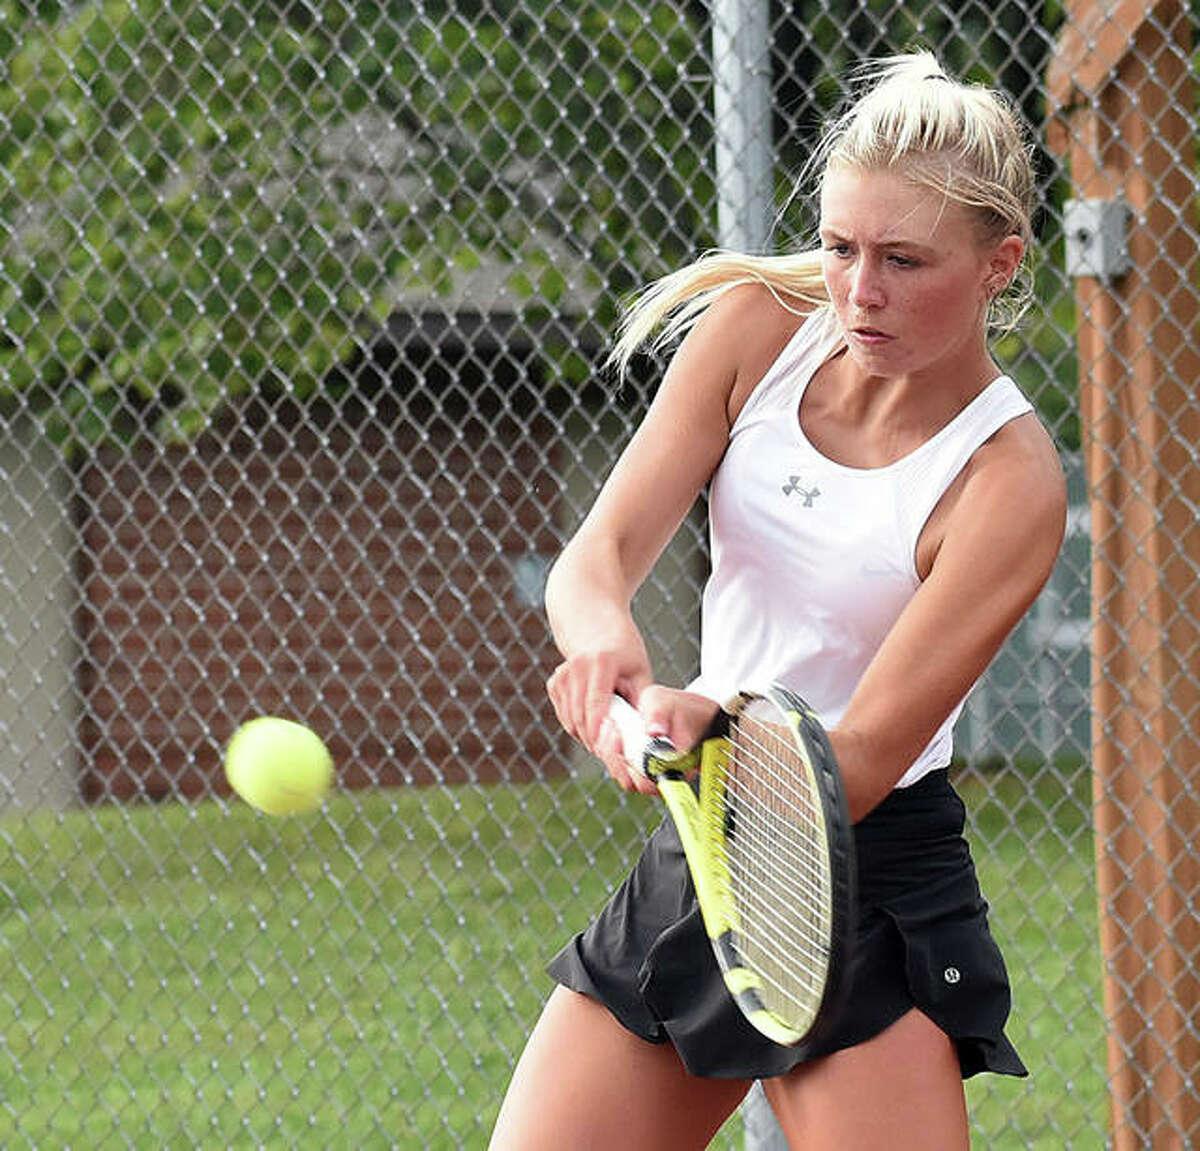 Edwardsville's Emma Herman slams a backhand shot during her doubles match against O'Fallon on Thursday inside the EHS Tennis Center.